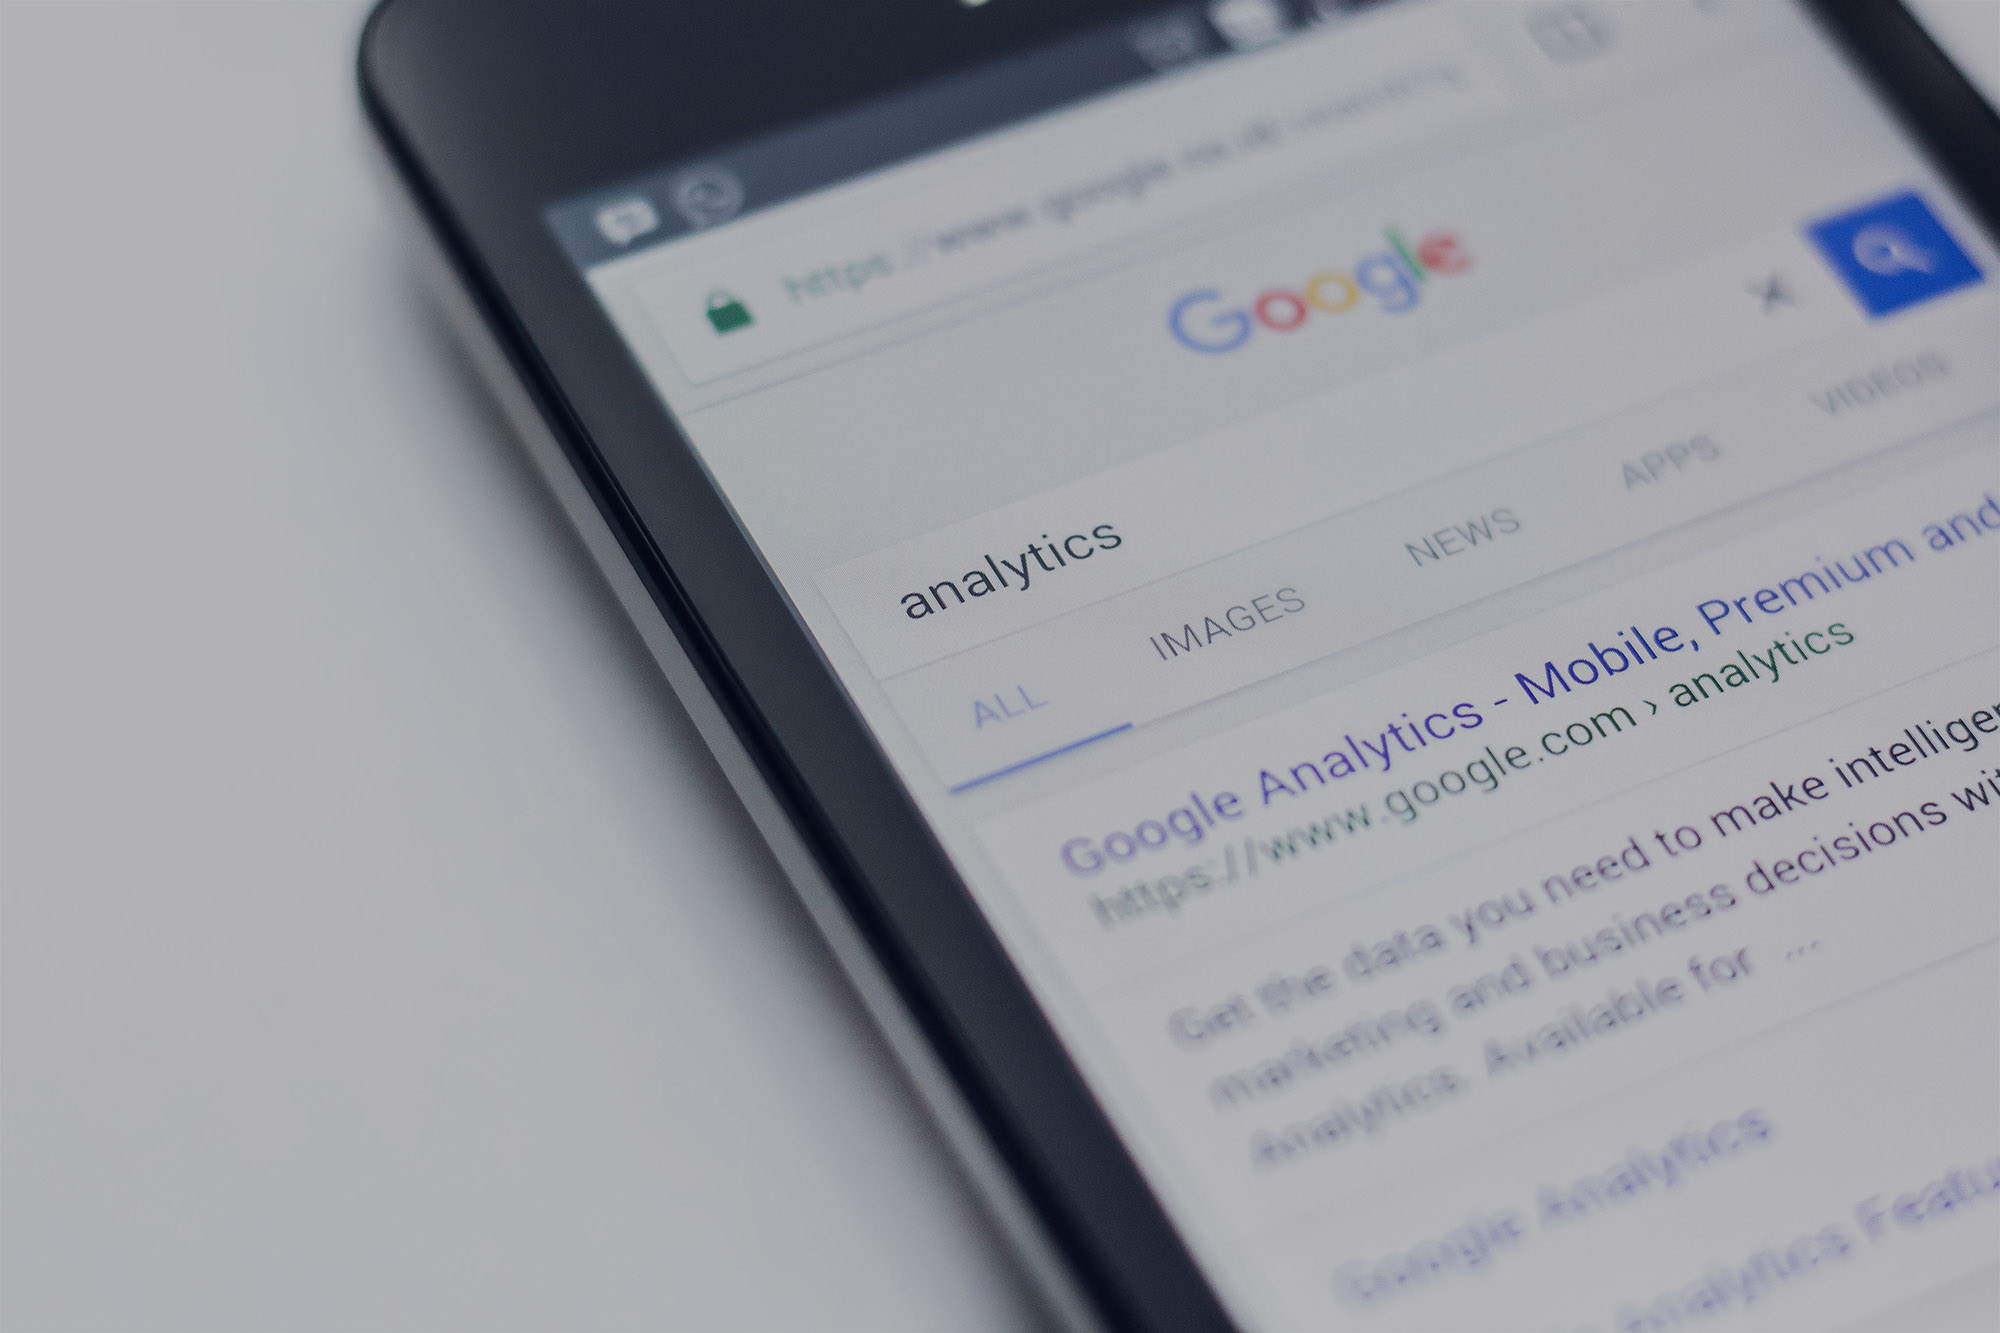 SEO Services | Search Engine Optimization Management